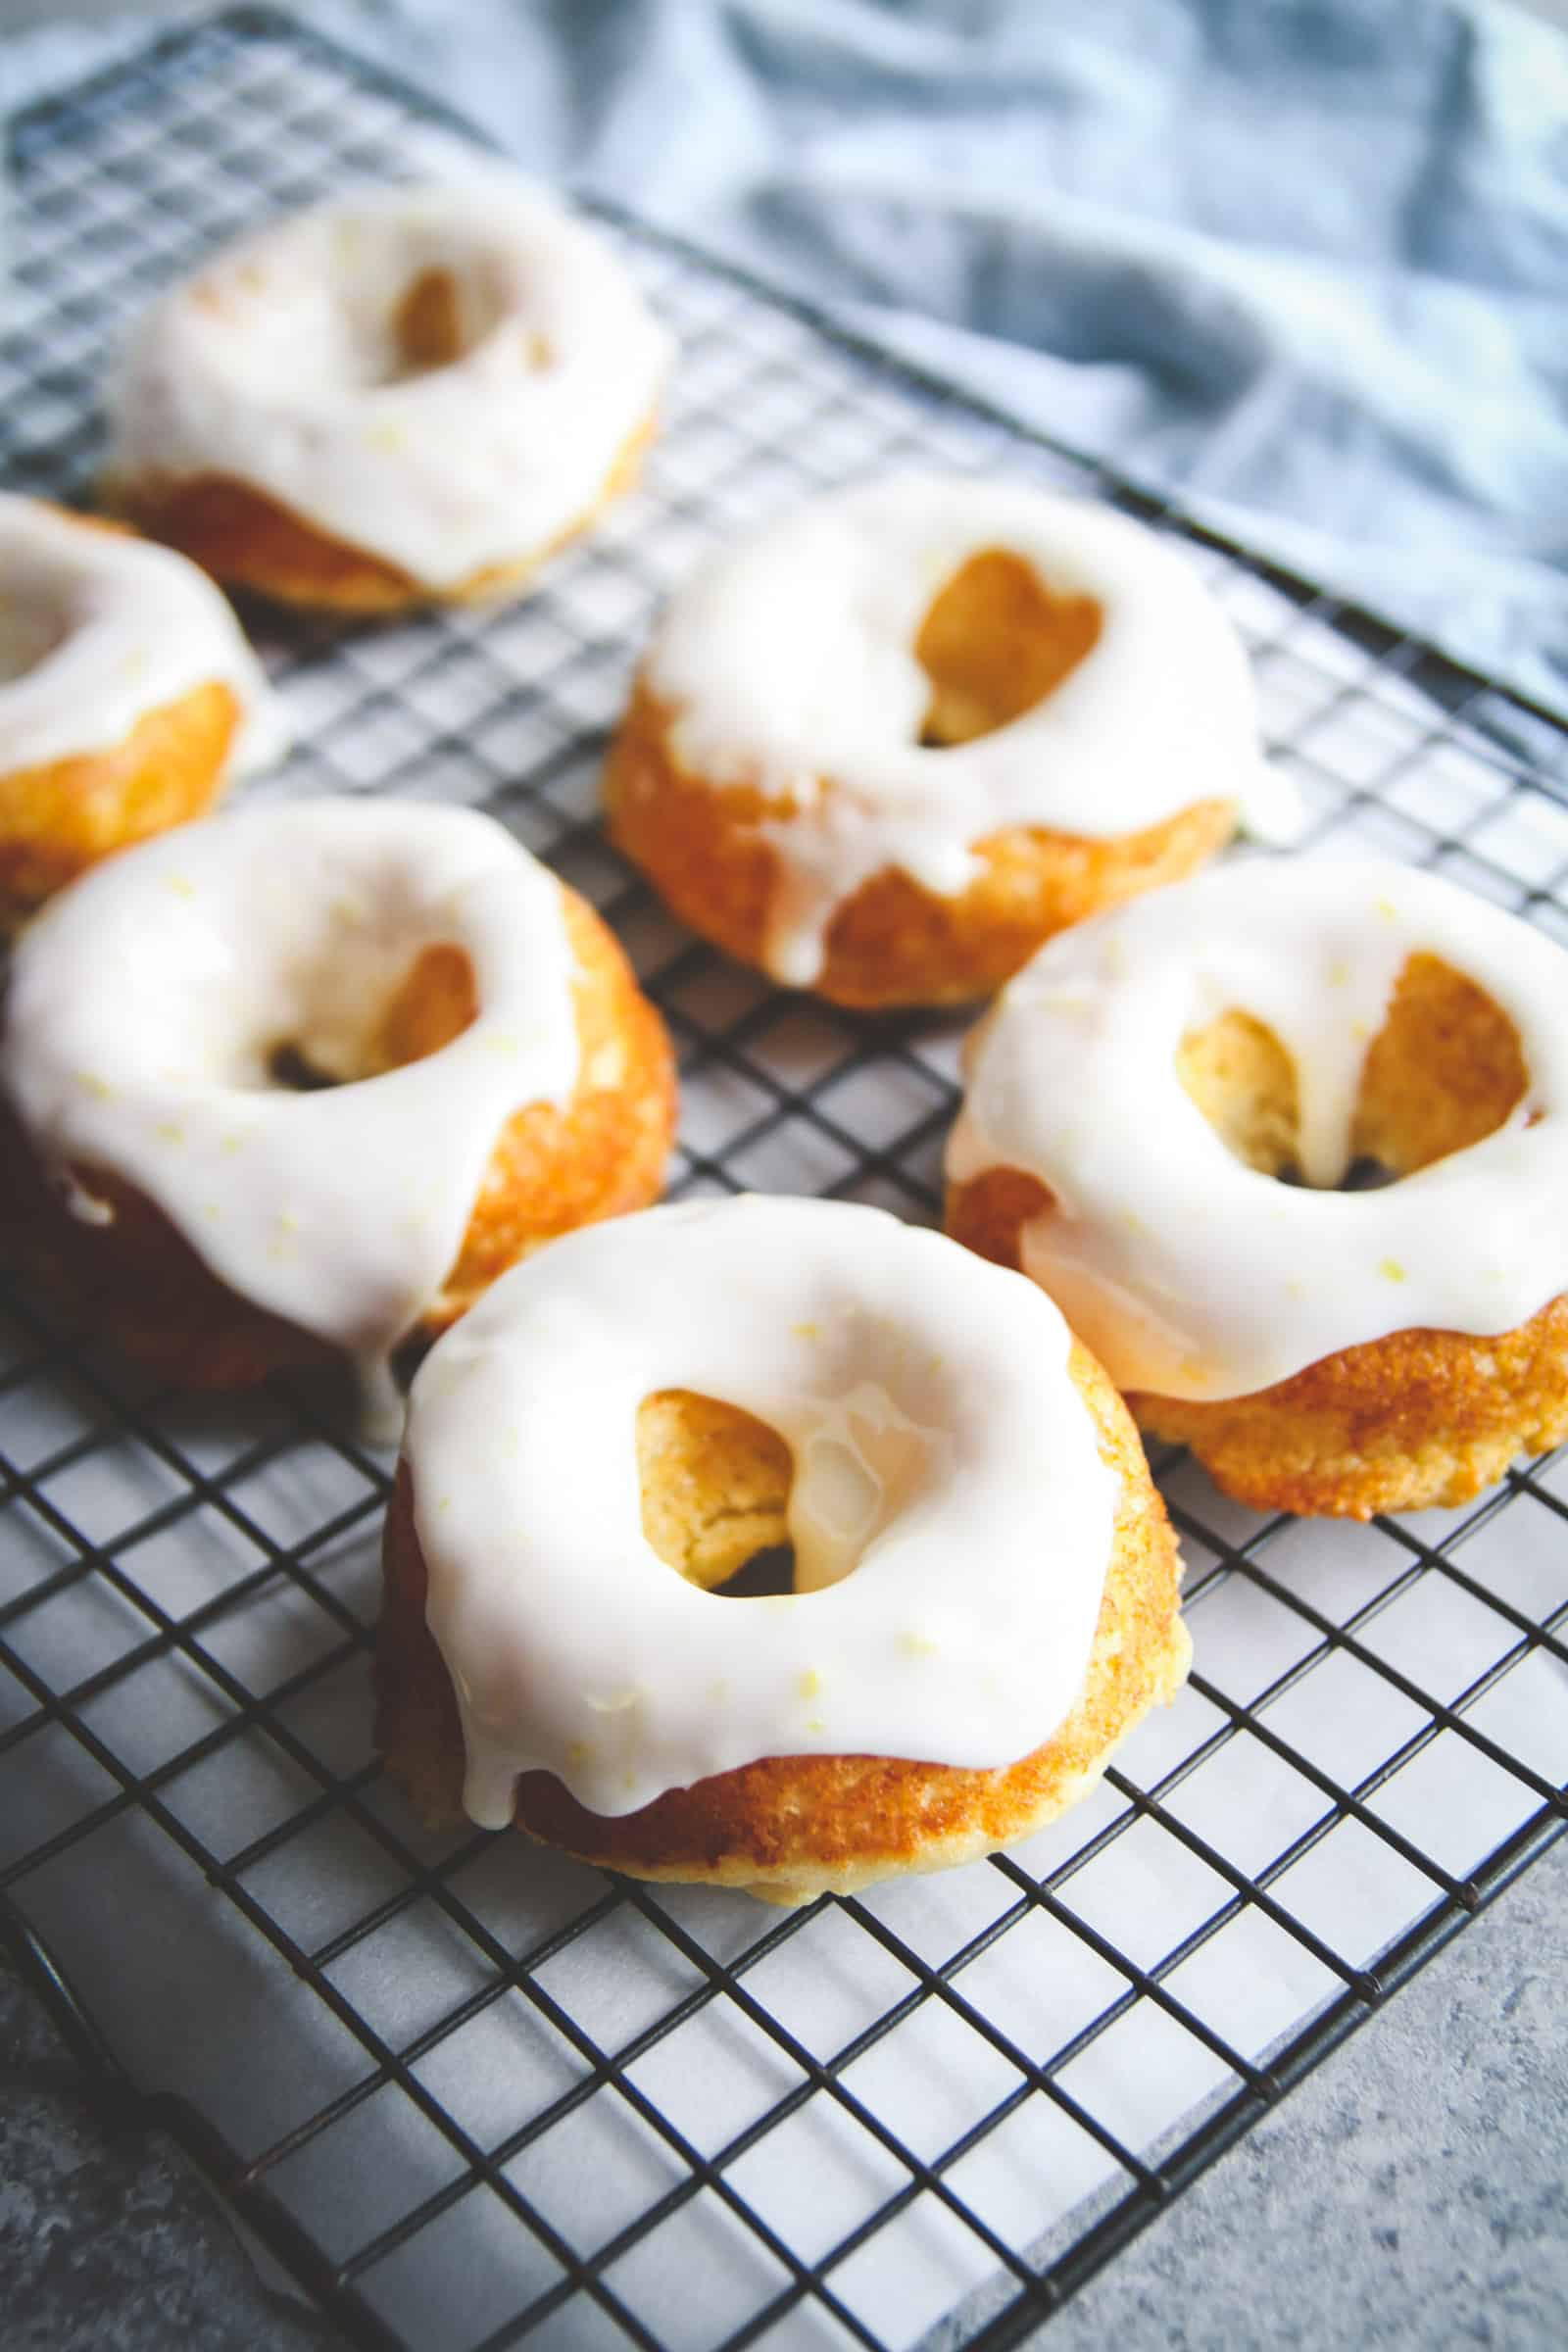 Baked lemon glazed donuts recipe. Baked doughnuts, lemon baked donuts recipe